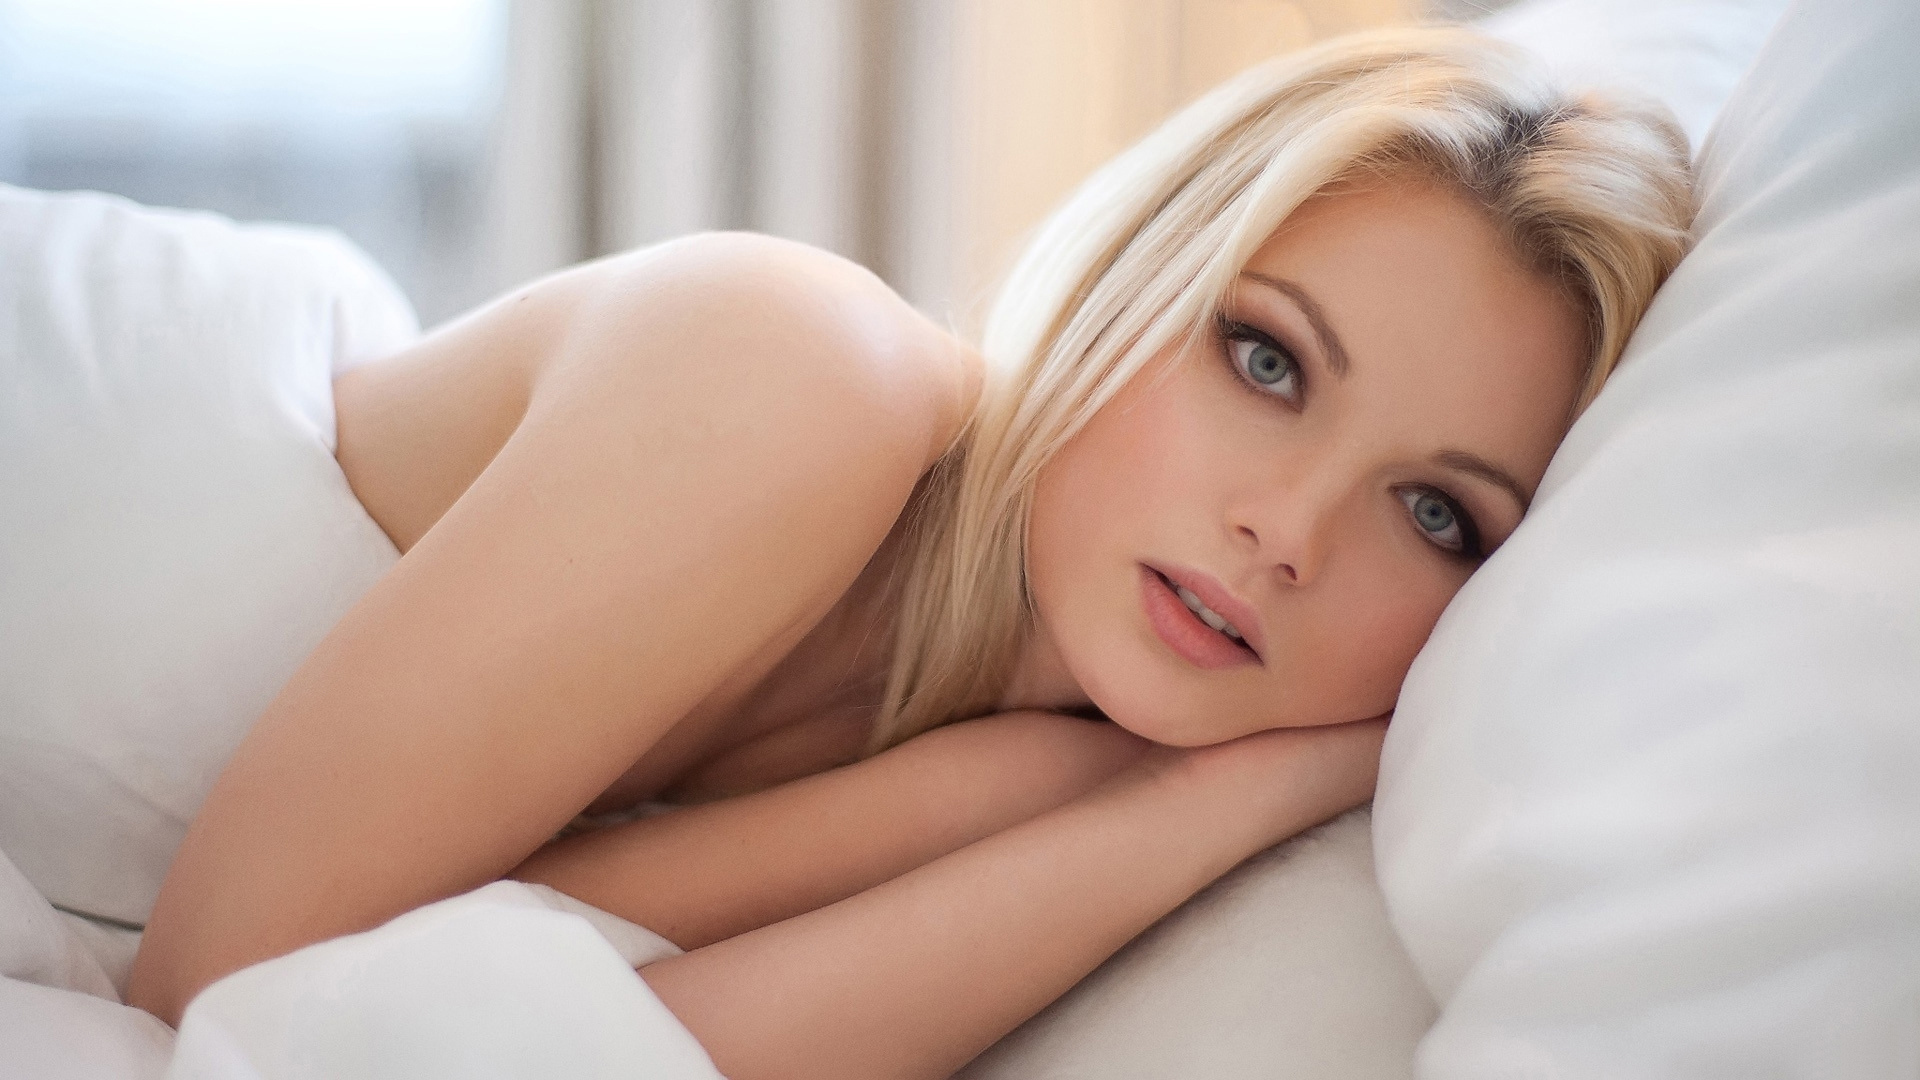 Heather mills porn nude